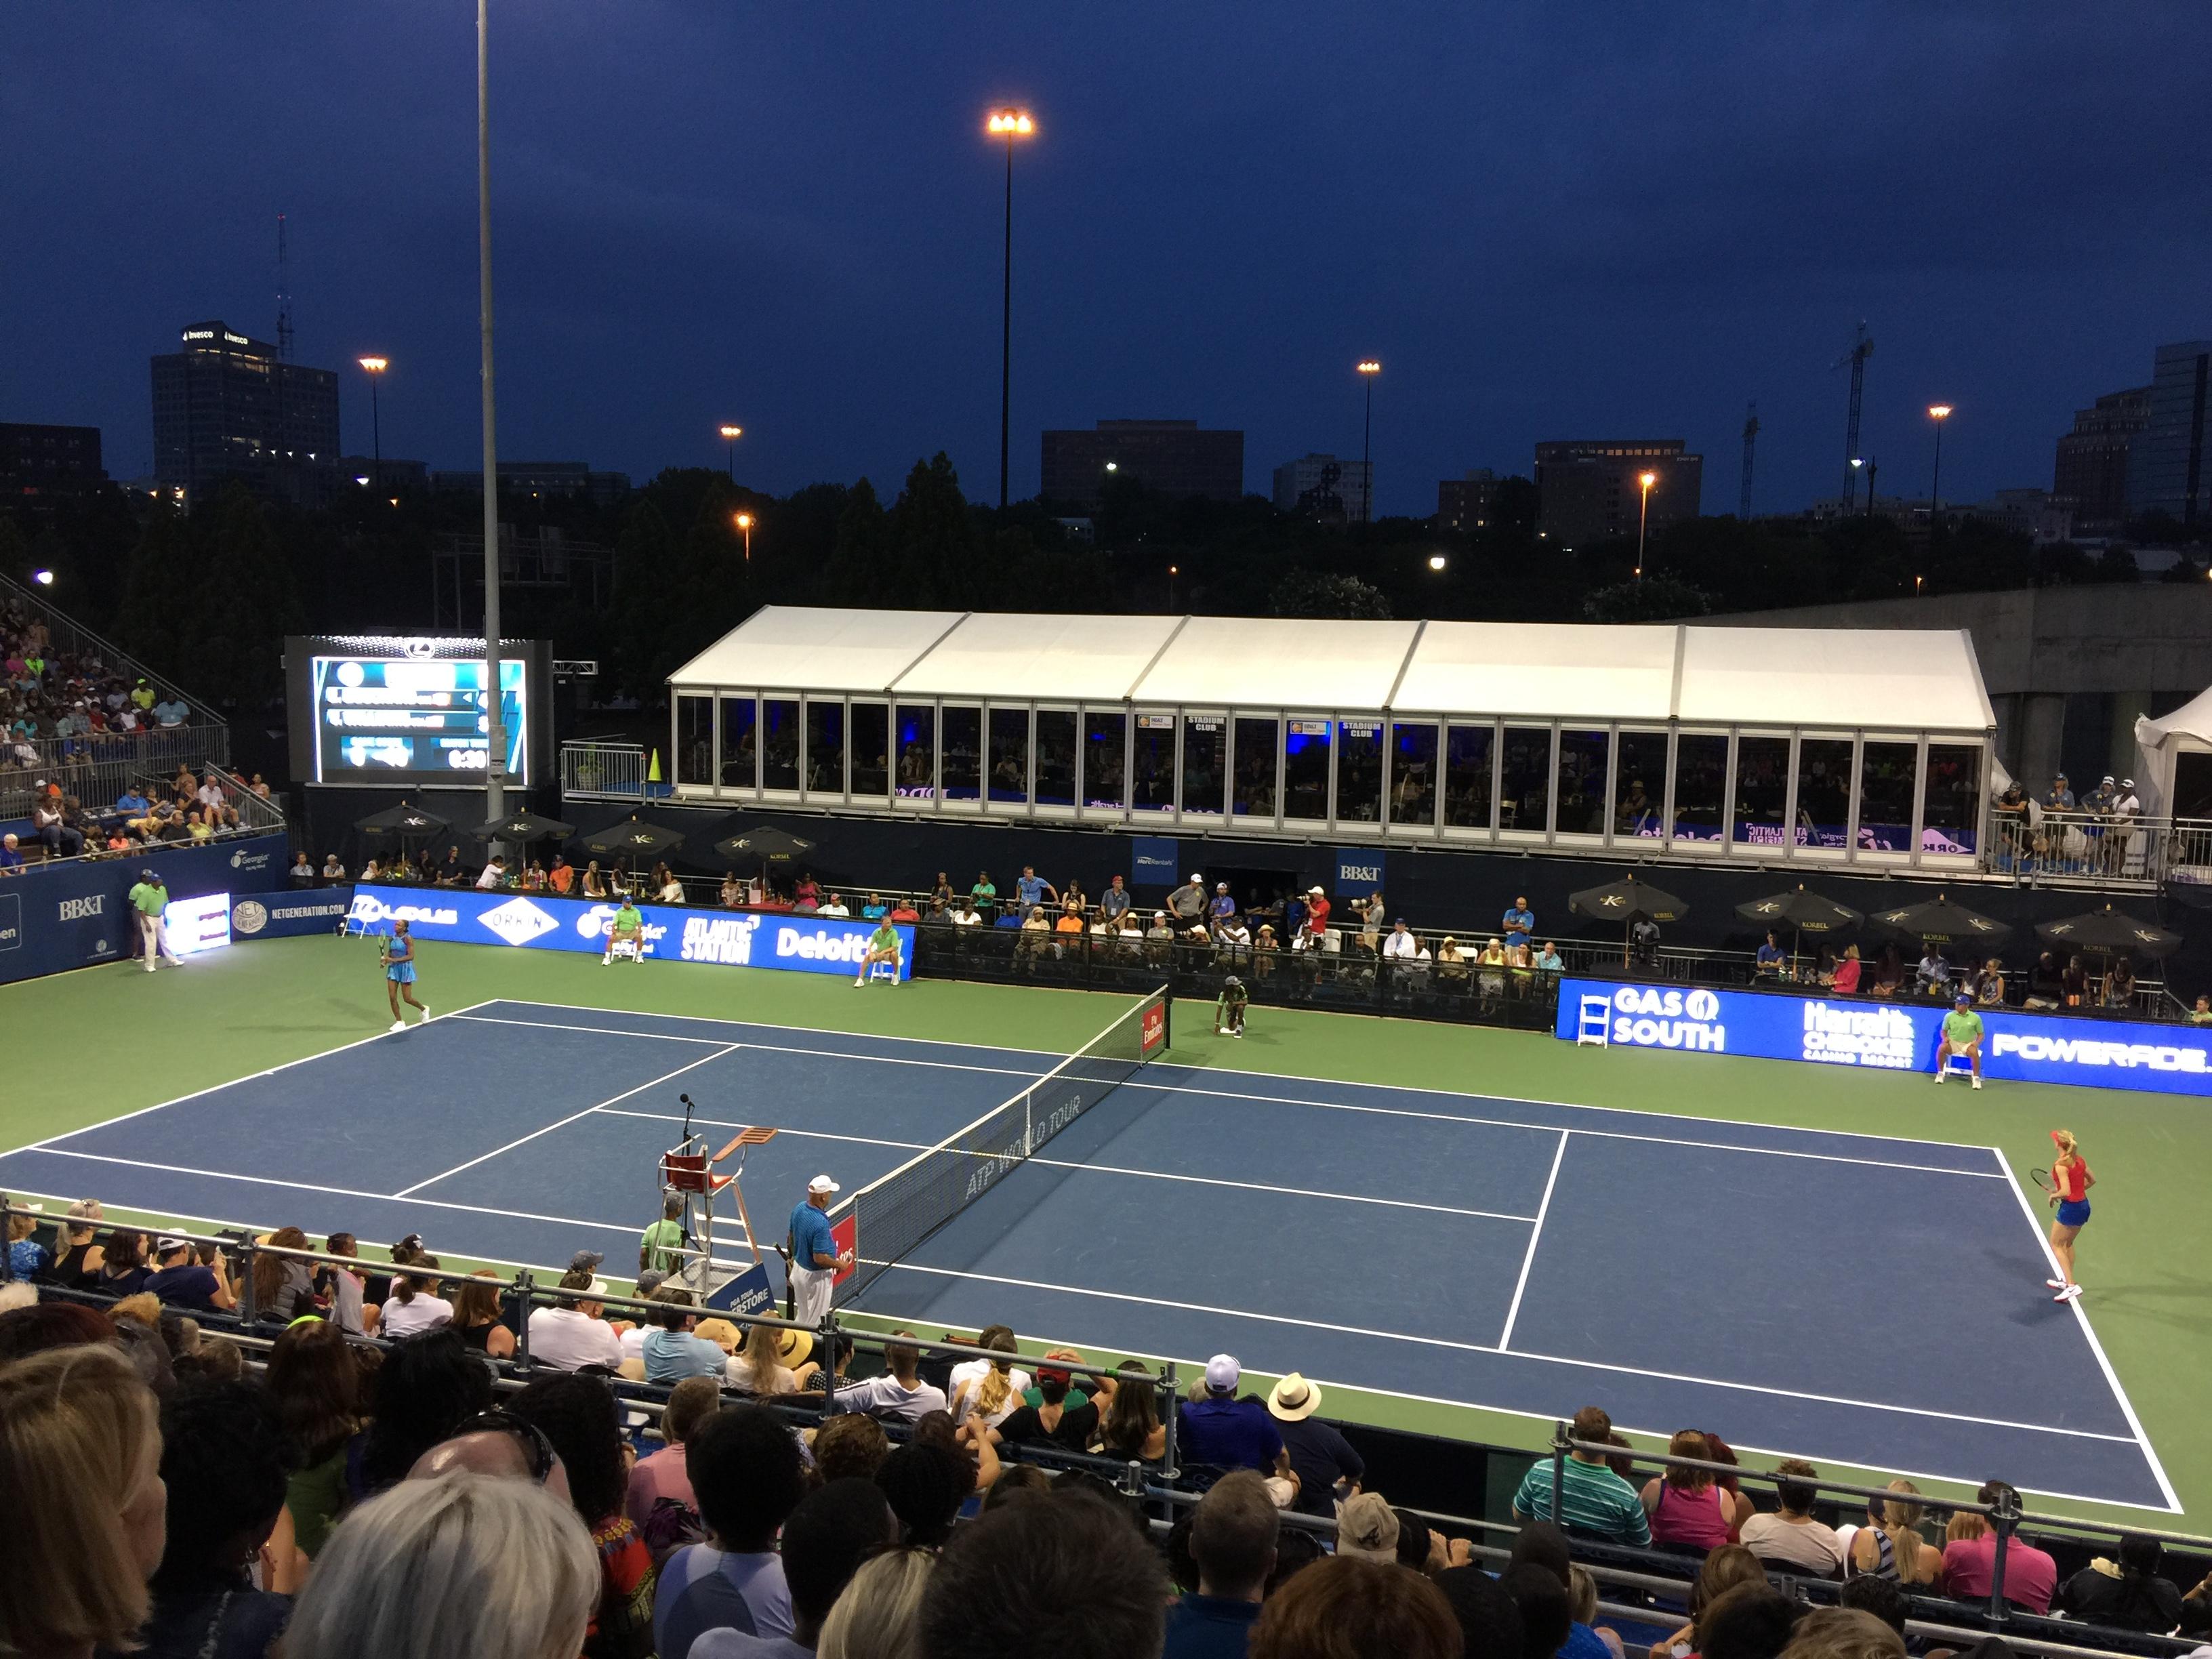 BB&T_Atlanta_Open_Venus_Williams_Genie_Bouchard